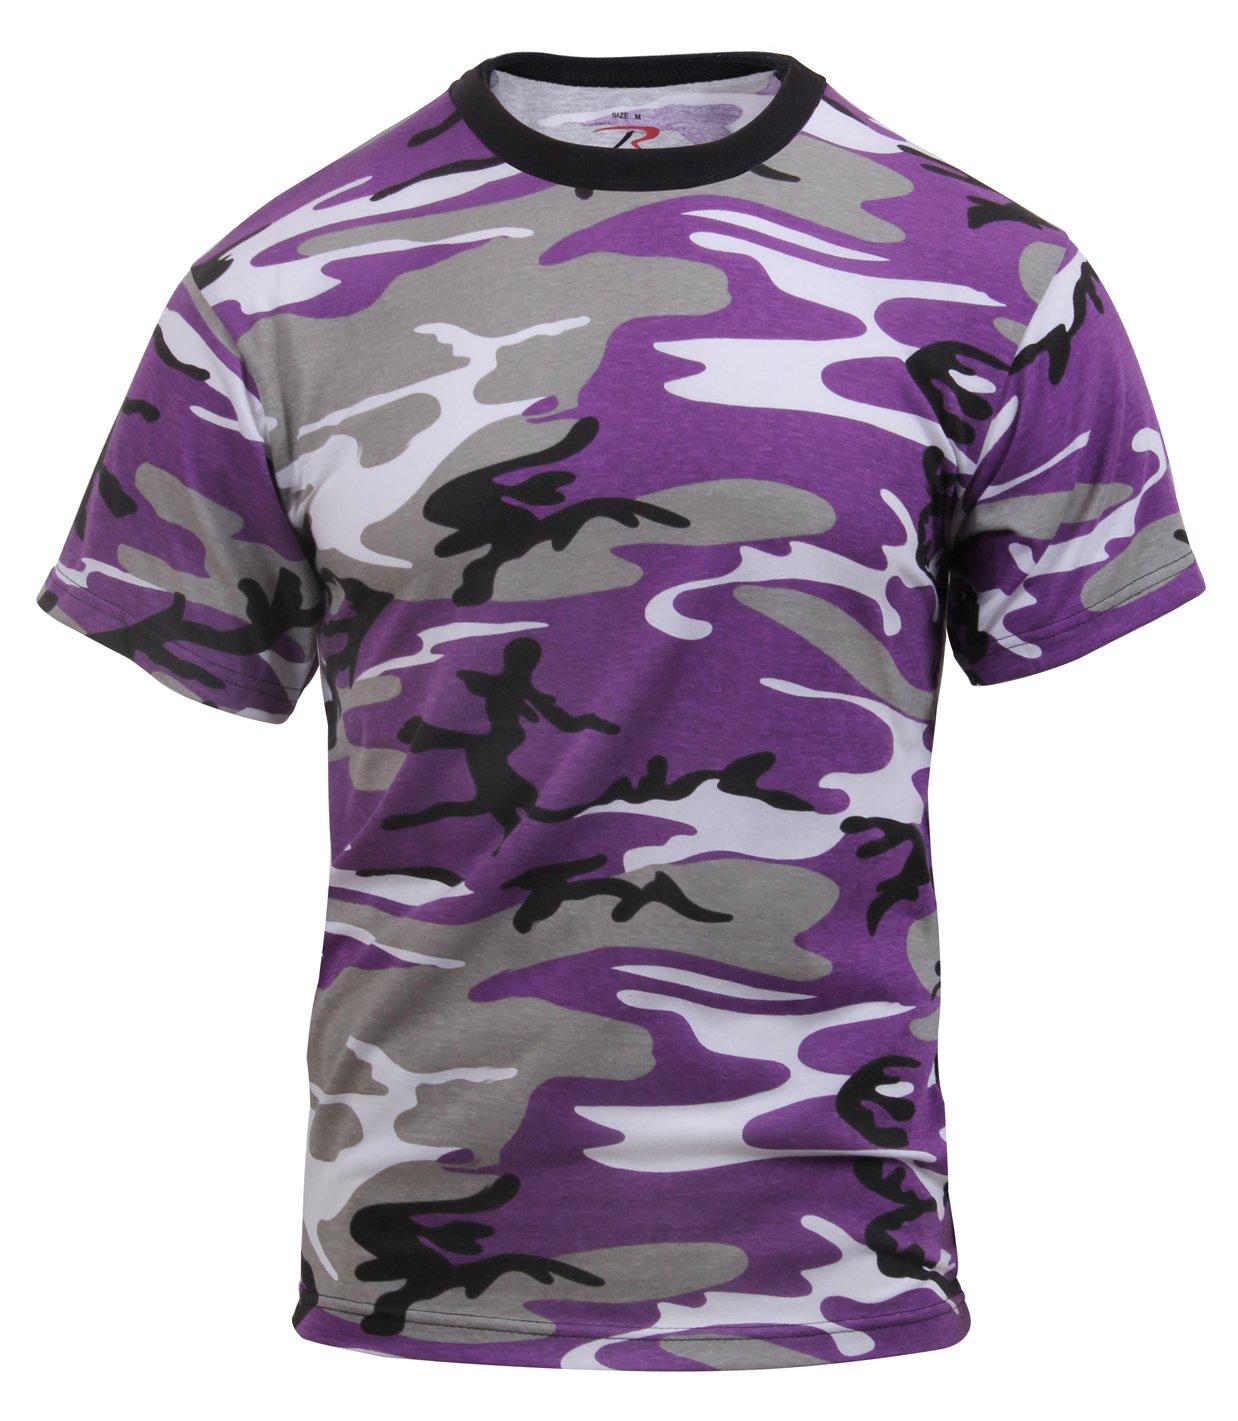 0cbf40fe0 Cheap Camo Shirts In Bulk - DREAMWORKS